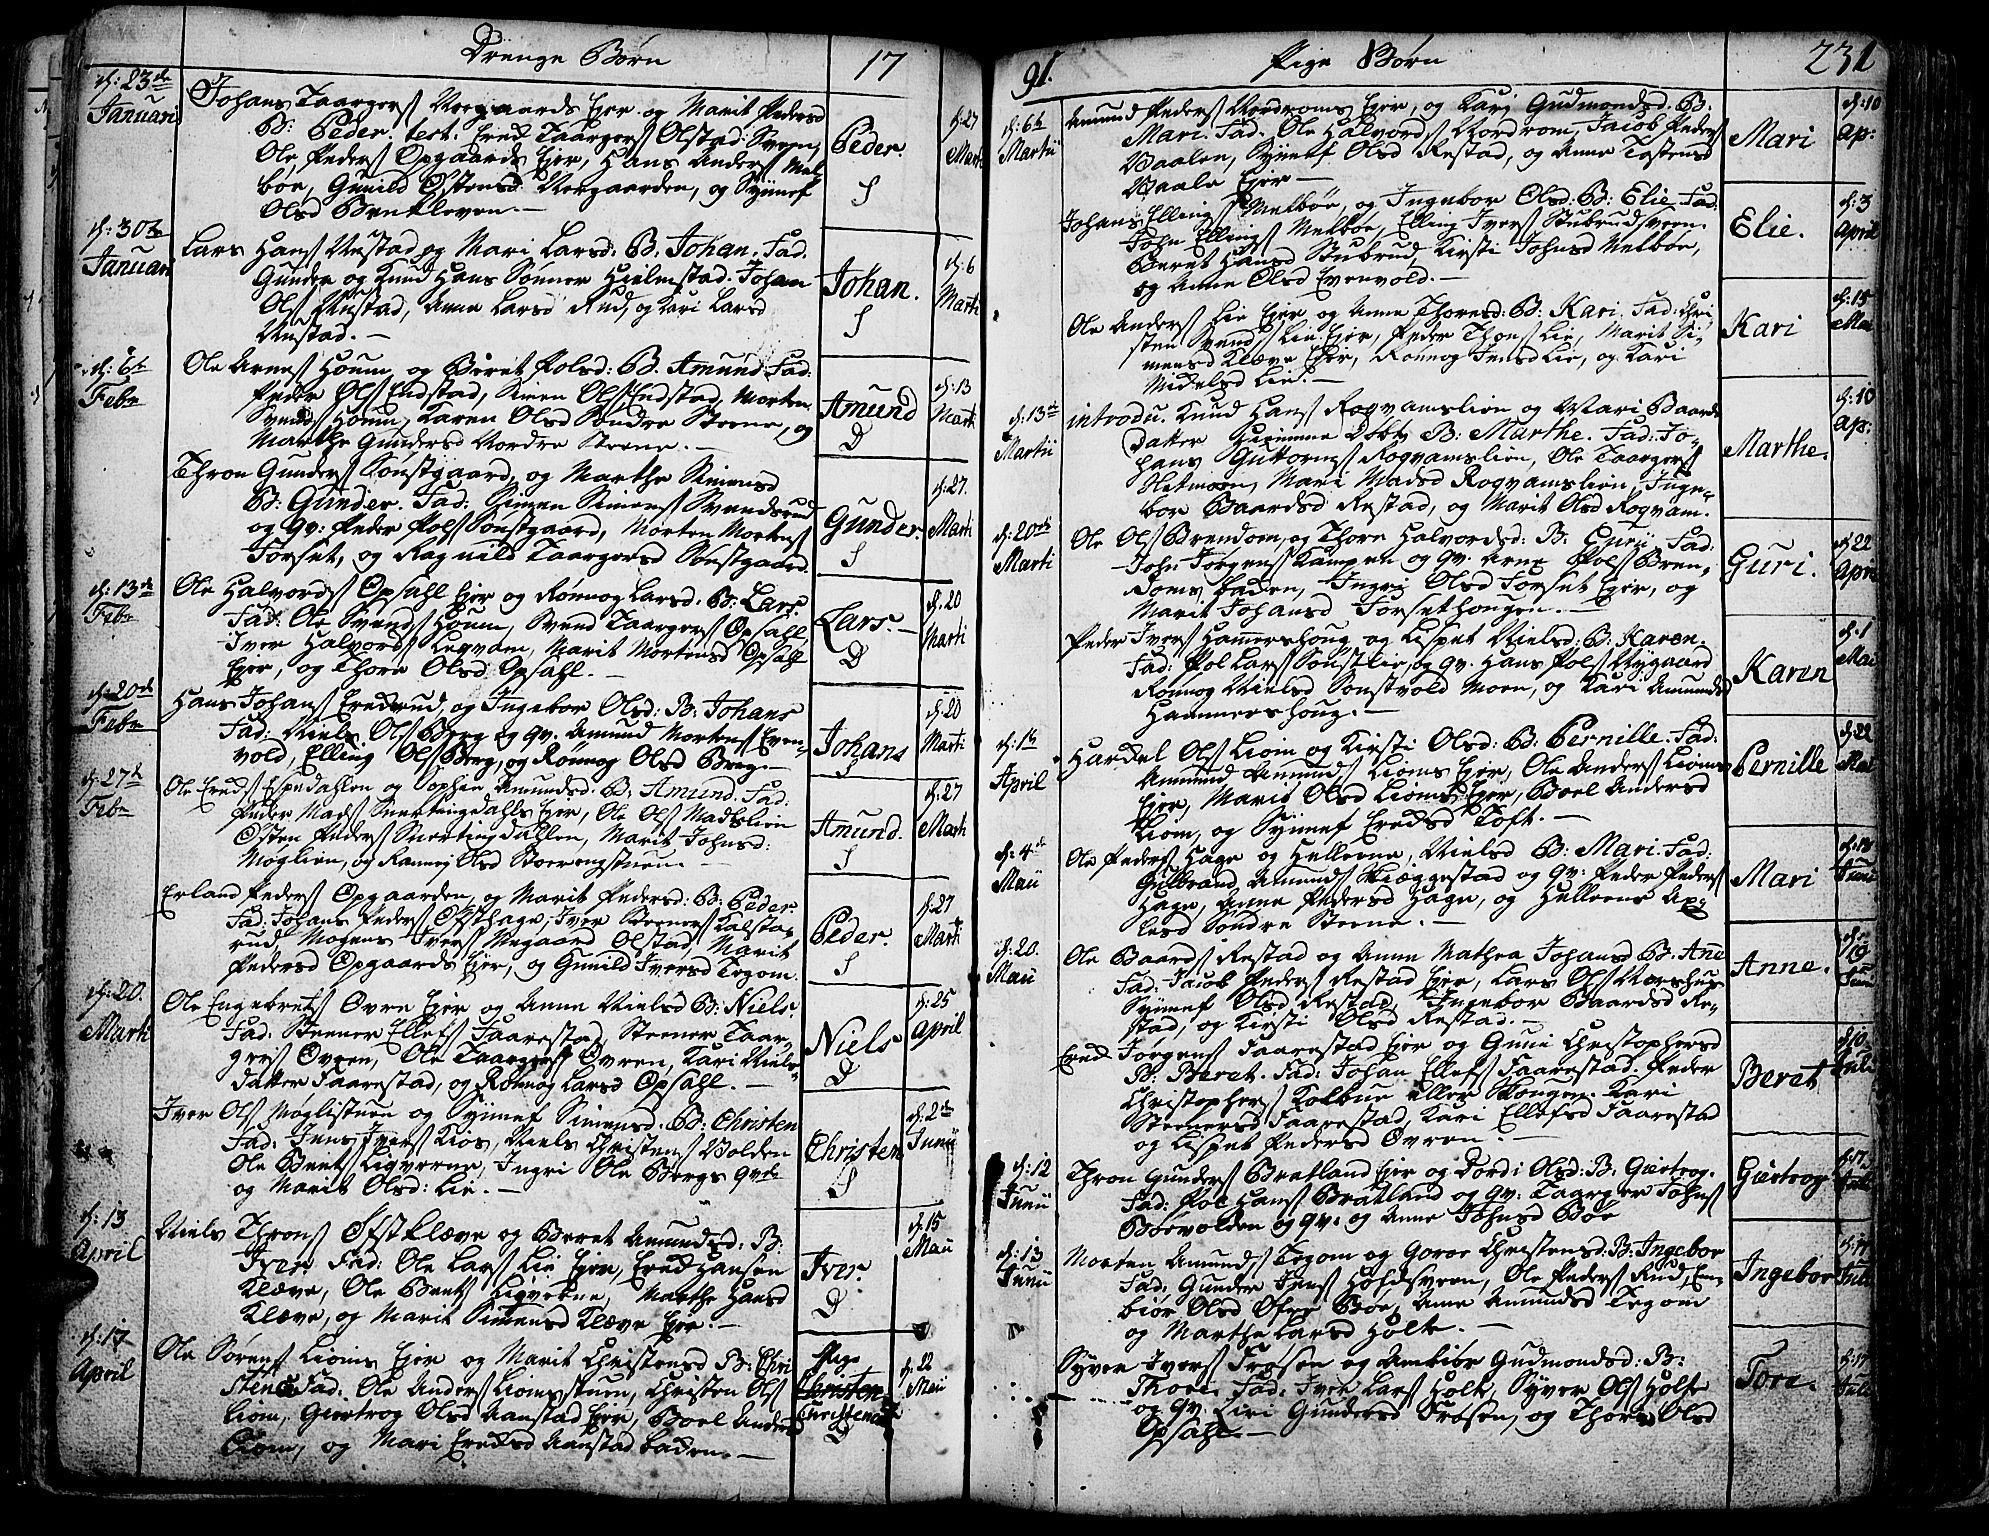 SAH, Gausdal prestekontor, Ministerialbok nr. 3, 1758-1809, s. 231